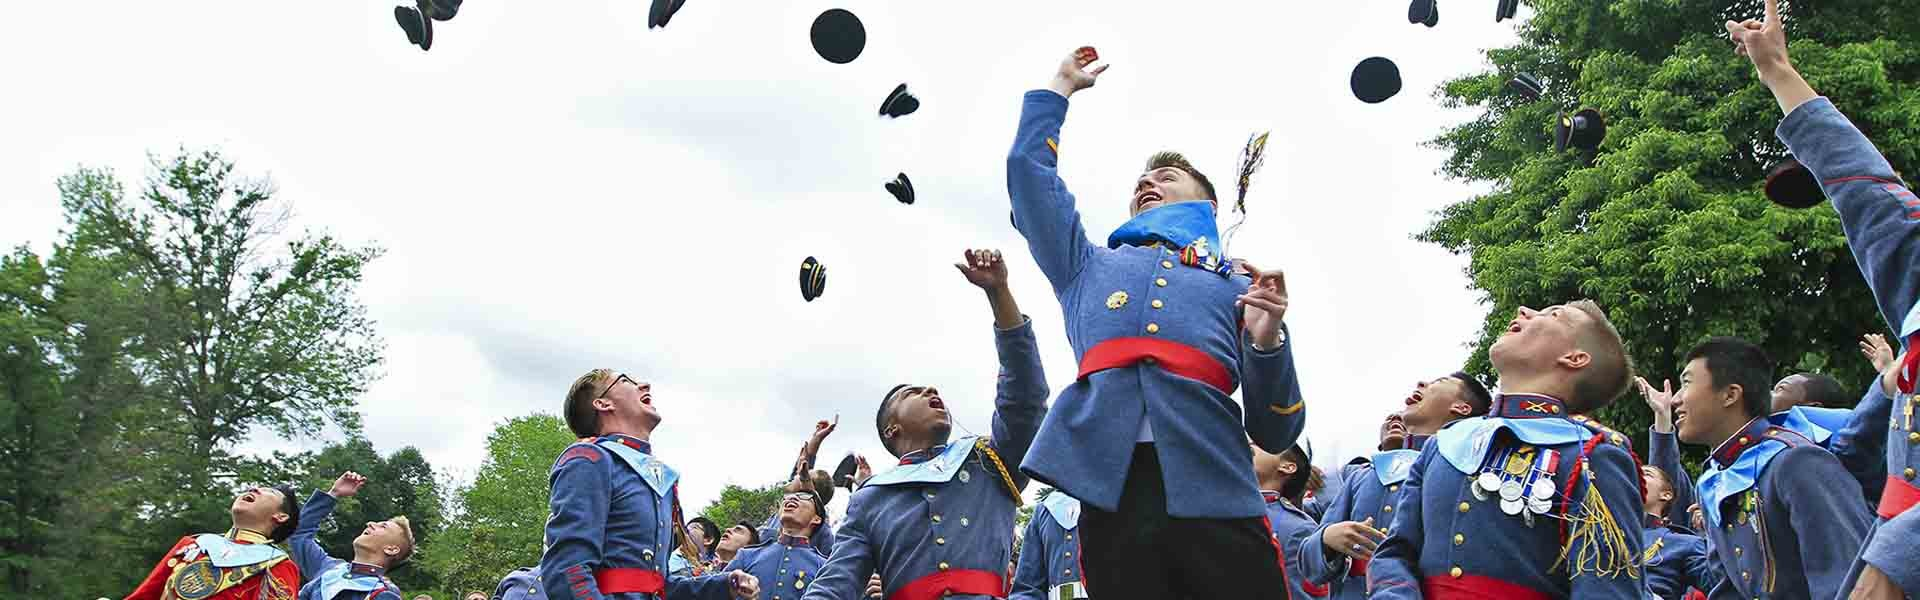 Valley Forge Pennsylvania USA Graduation Banner 2019